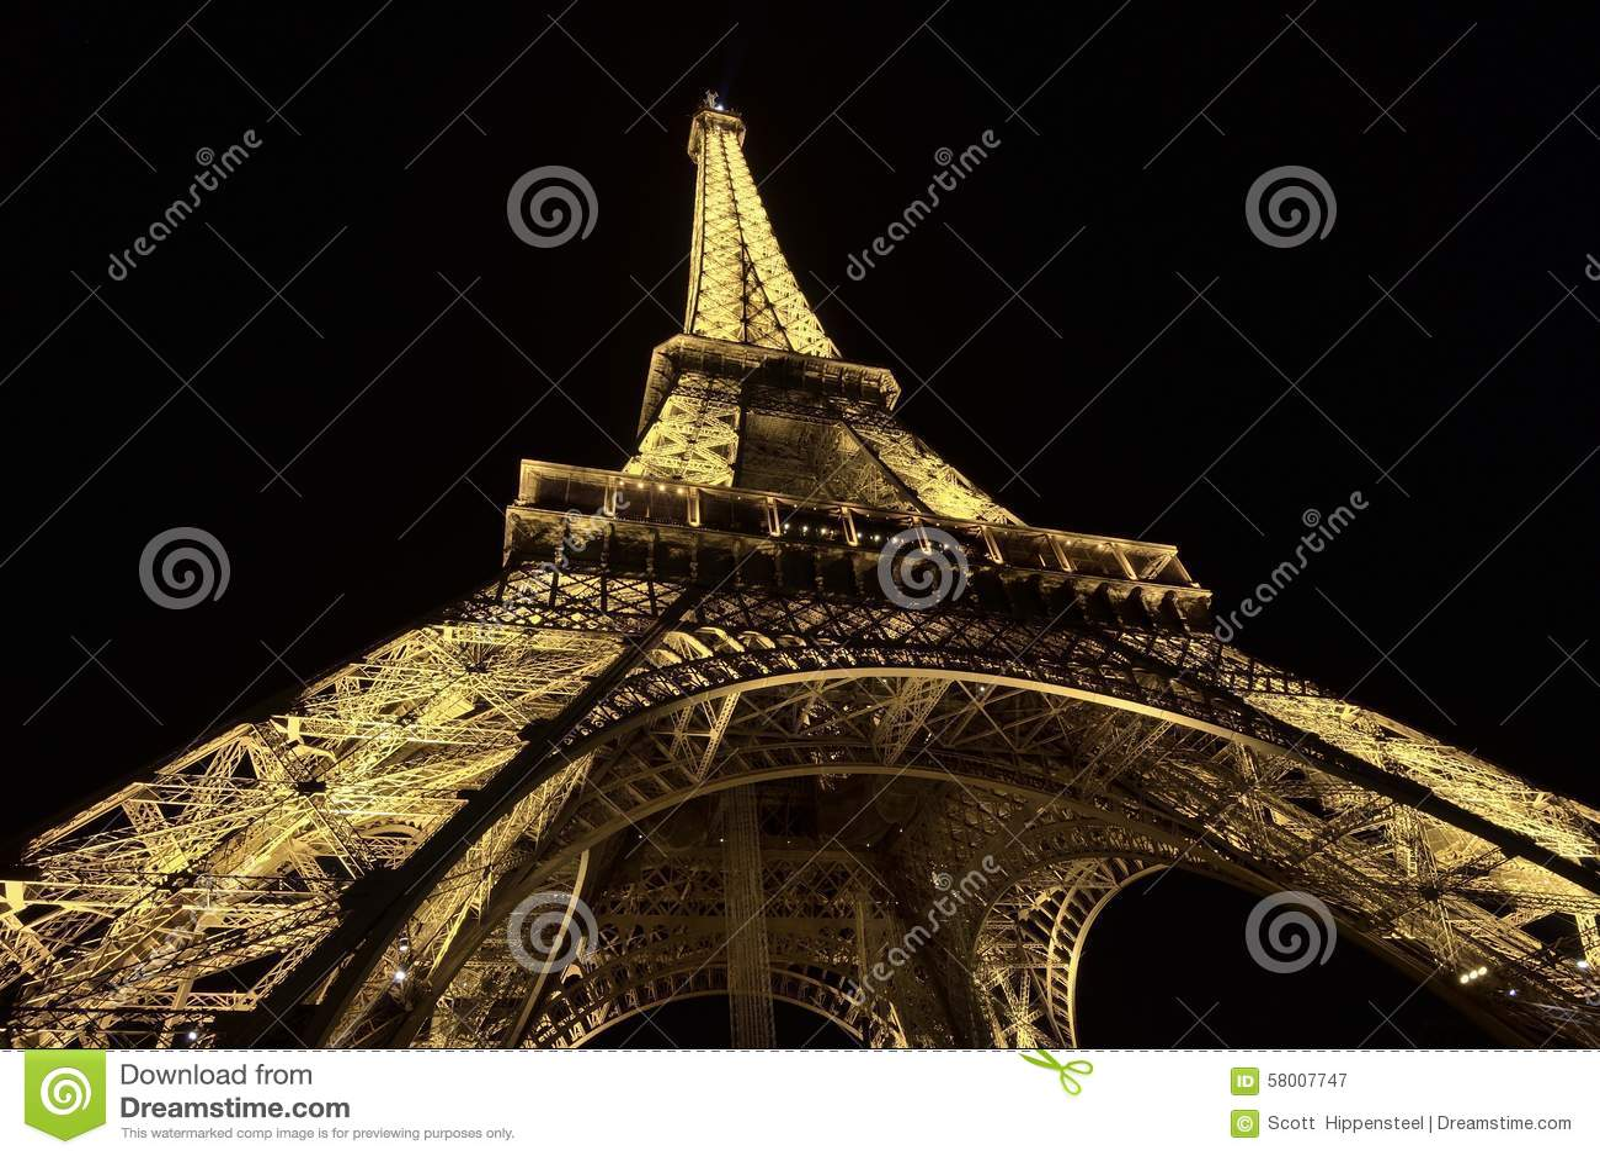 Allumage du monde de Paris